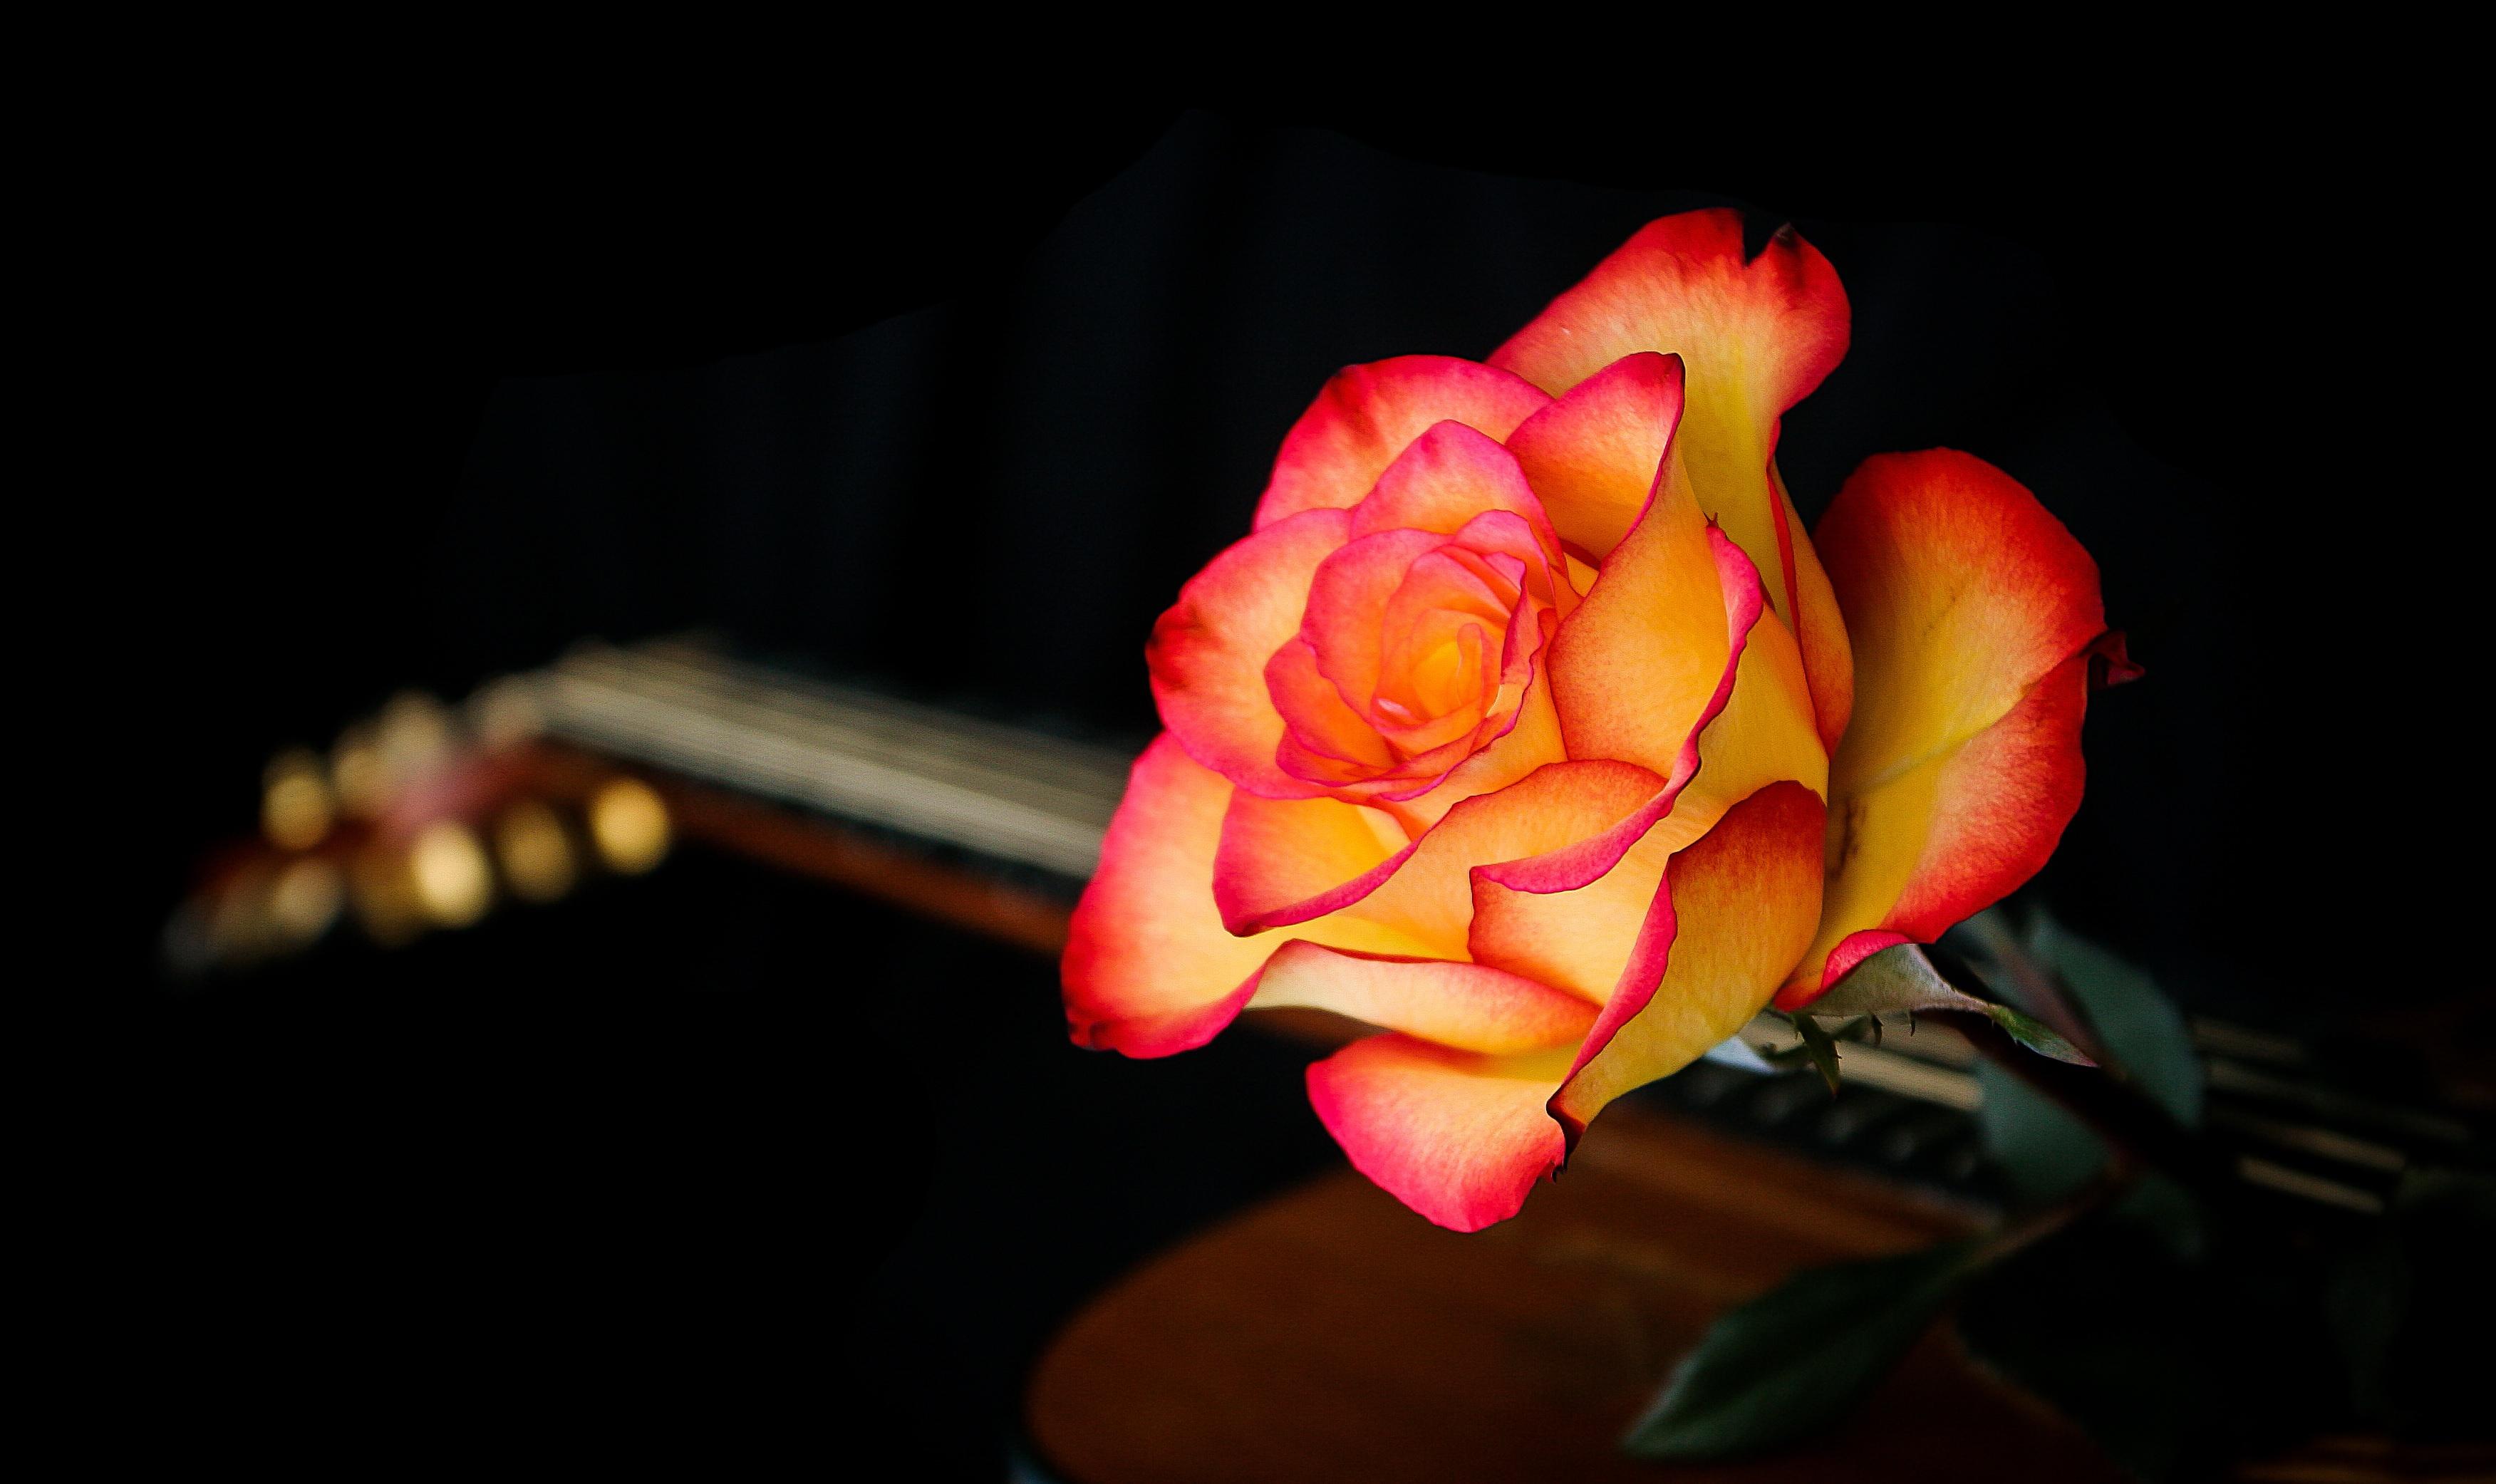 Flowers / Rose Flower Wallpaper - 8k Wallpapers Of Rose Flowers , HD Wallpaper & Backgrounds